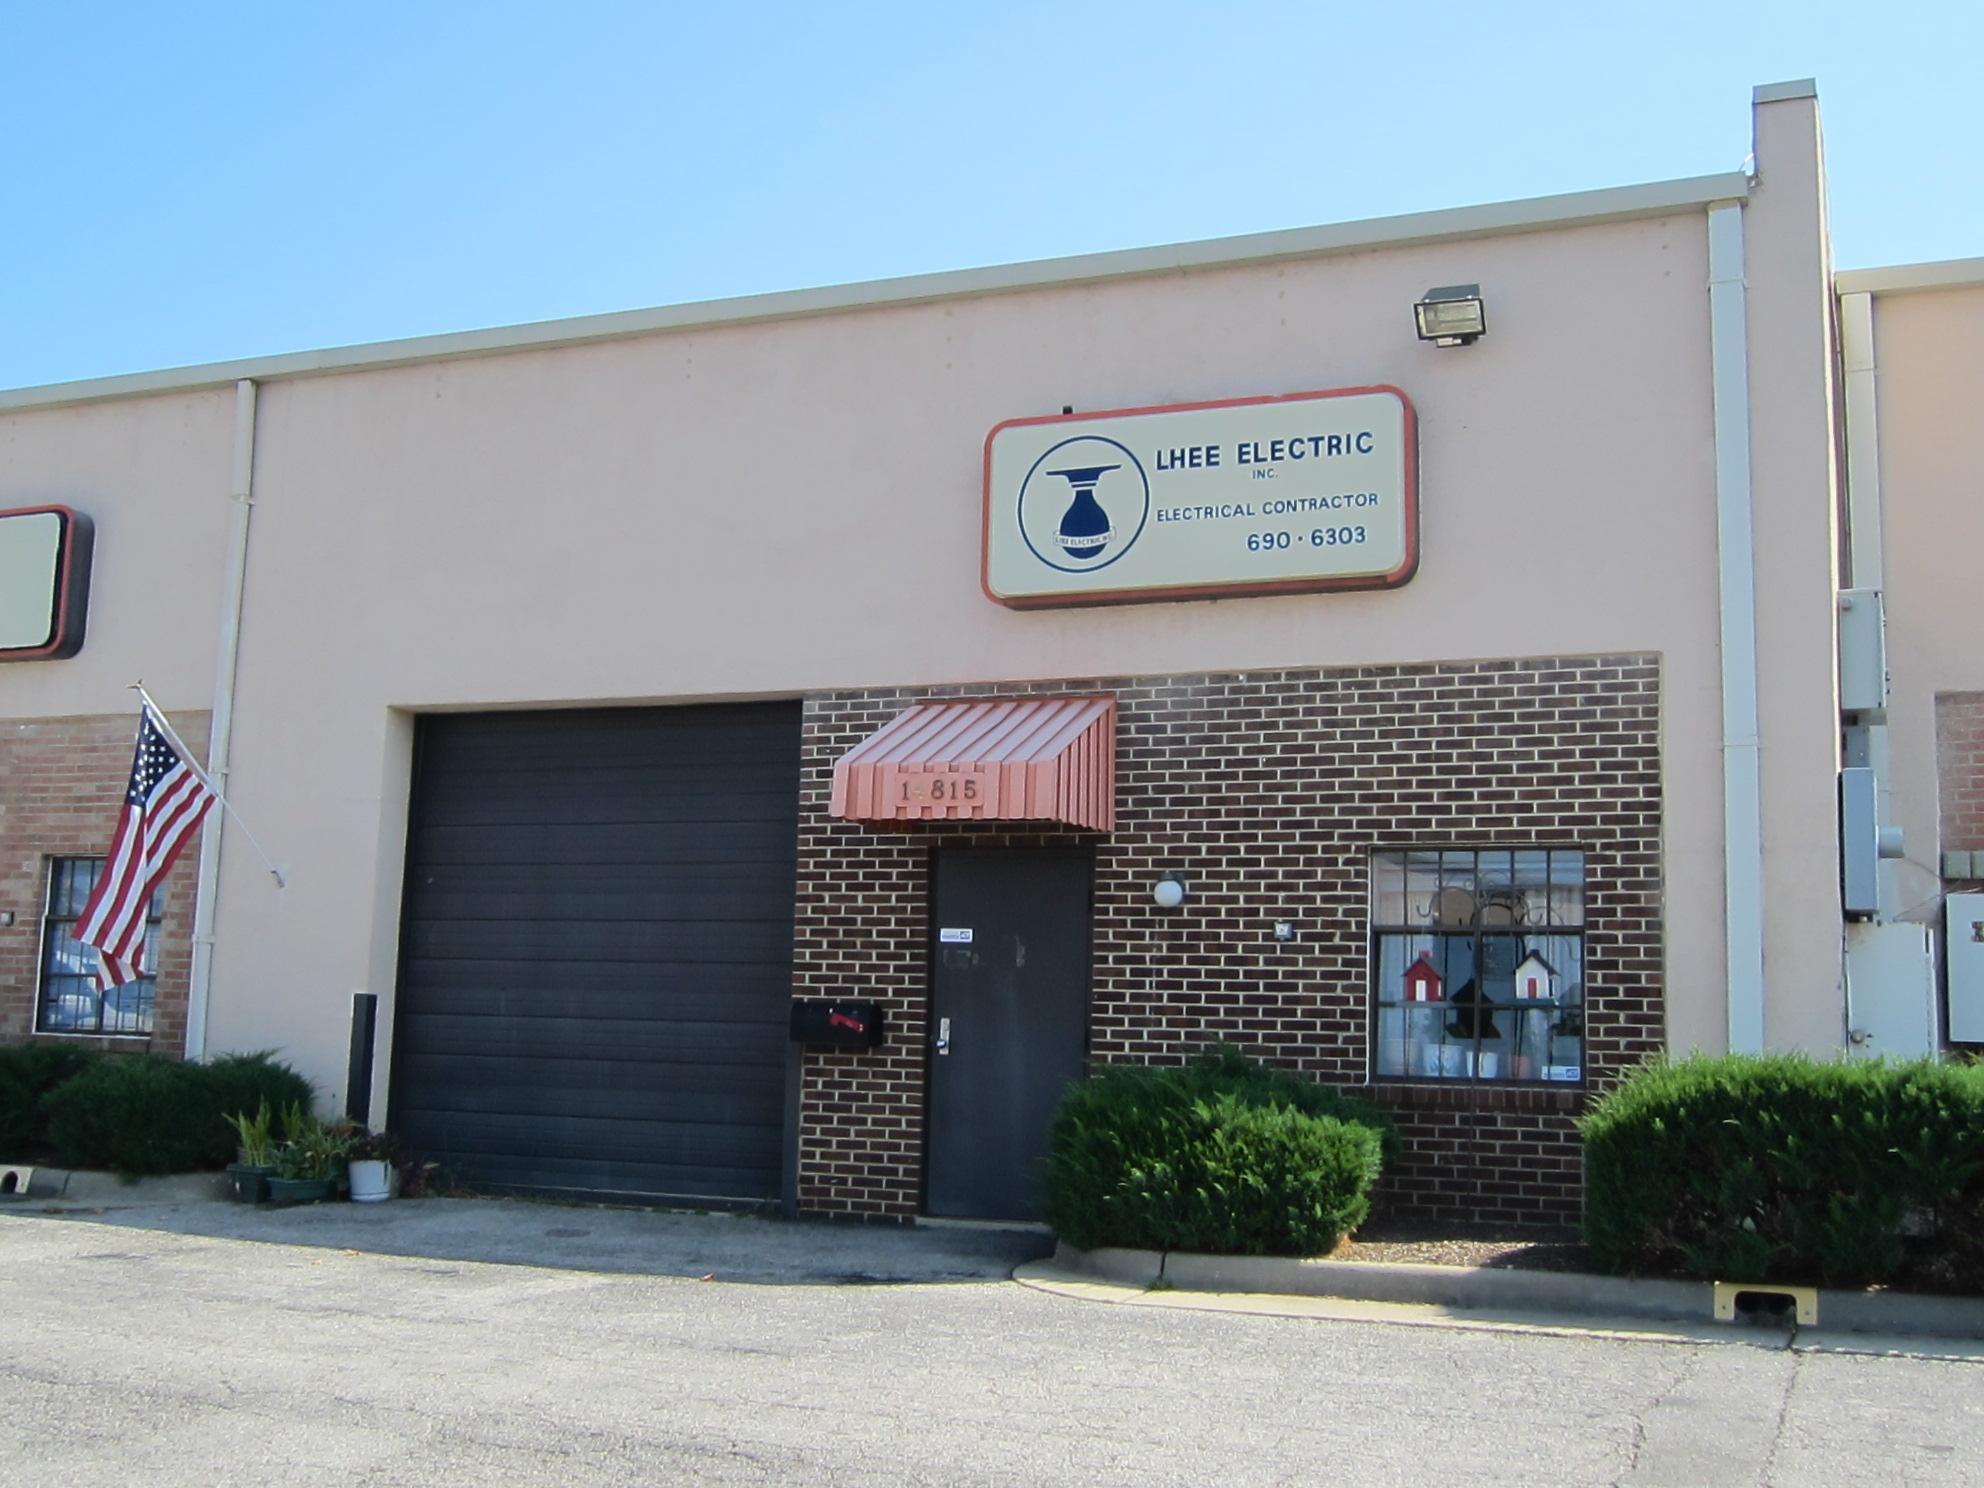 Lhee Electric Co Inc In Woodbridge Va 703 690 6303